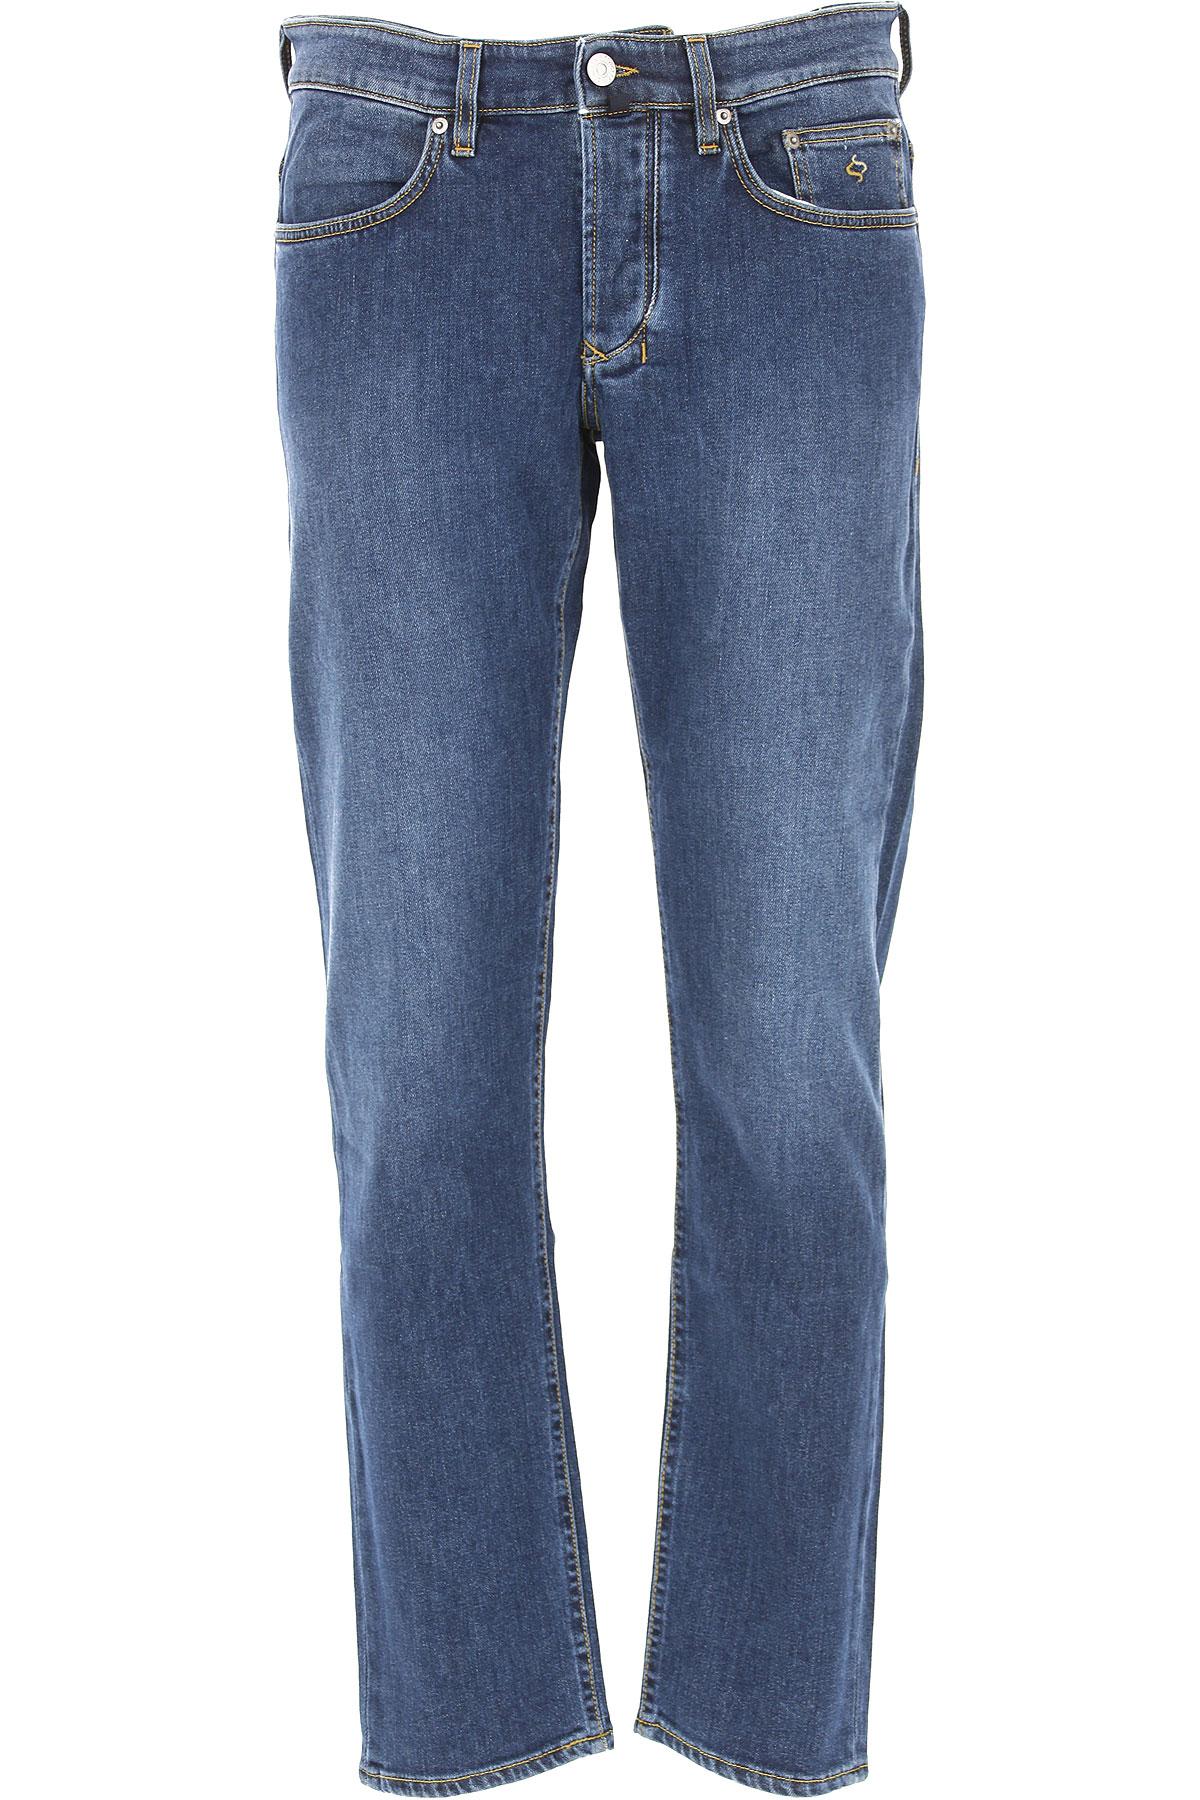 Image of Siviglia Jeans, Denim Blue, Cotton, 2017, 32 33 35 36 38